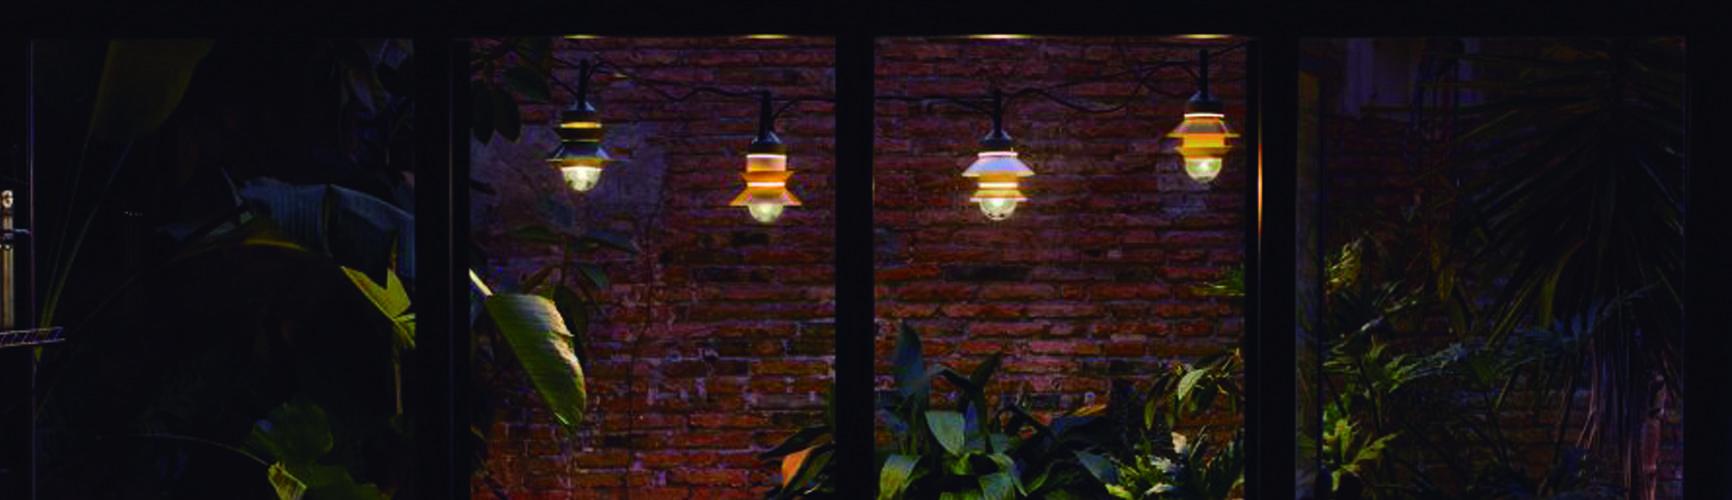 tienda de lamparas online e iluminacion